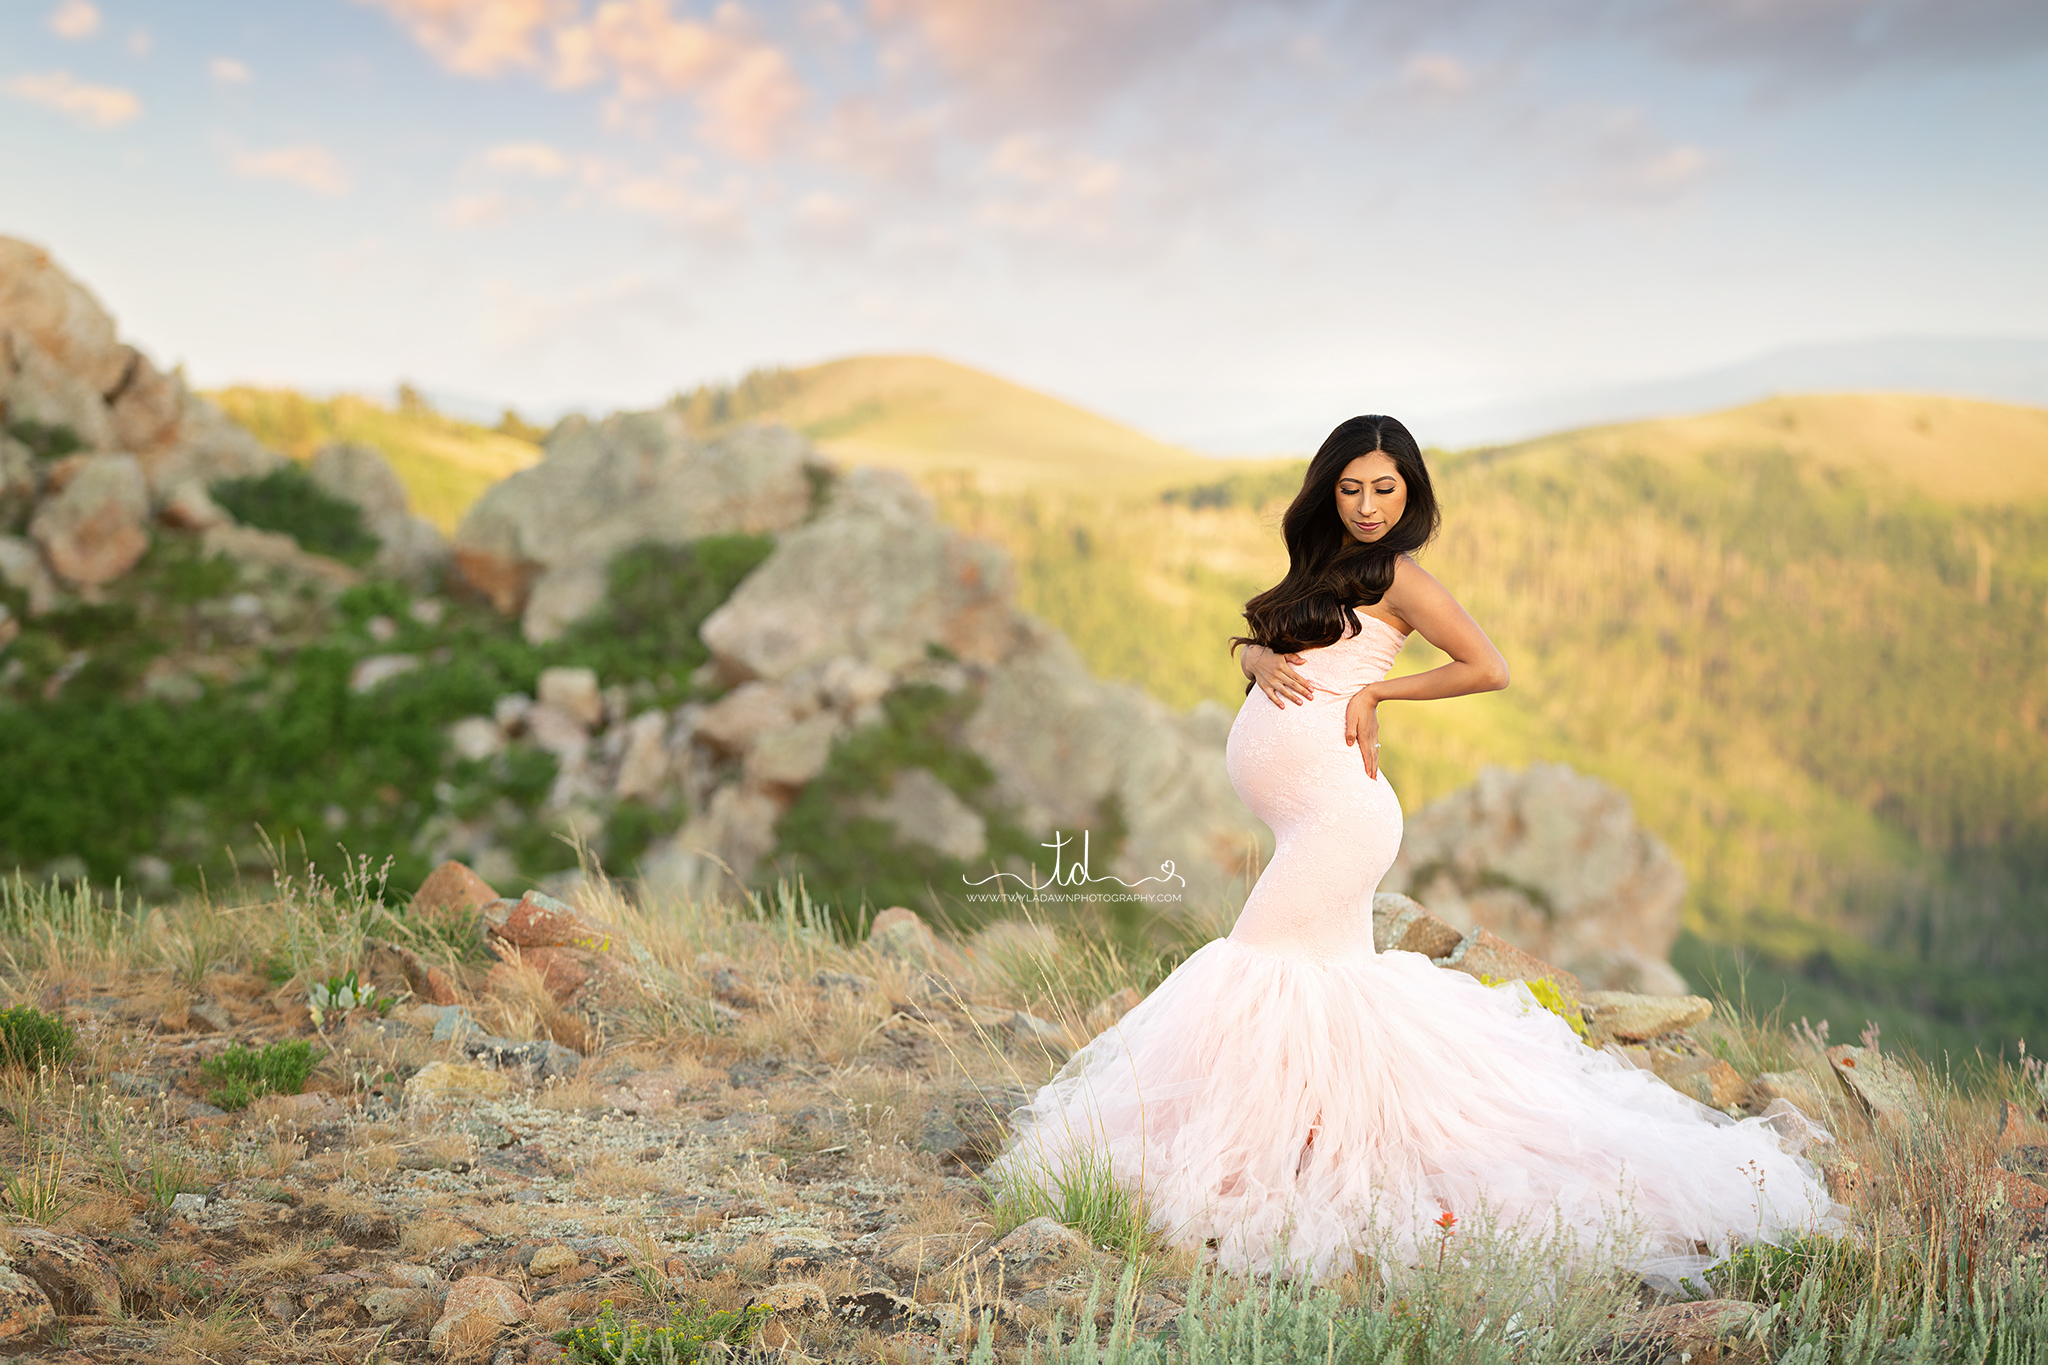 Utah Maternity Photographer | Salt Lake Maternity Photographer | Utah Maternity Gown Photographer